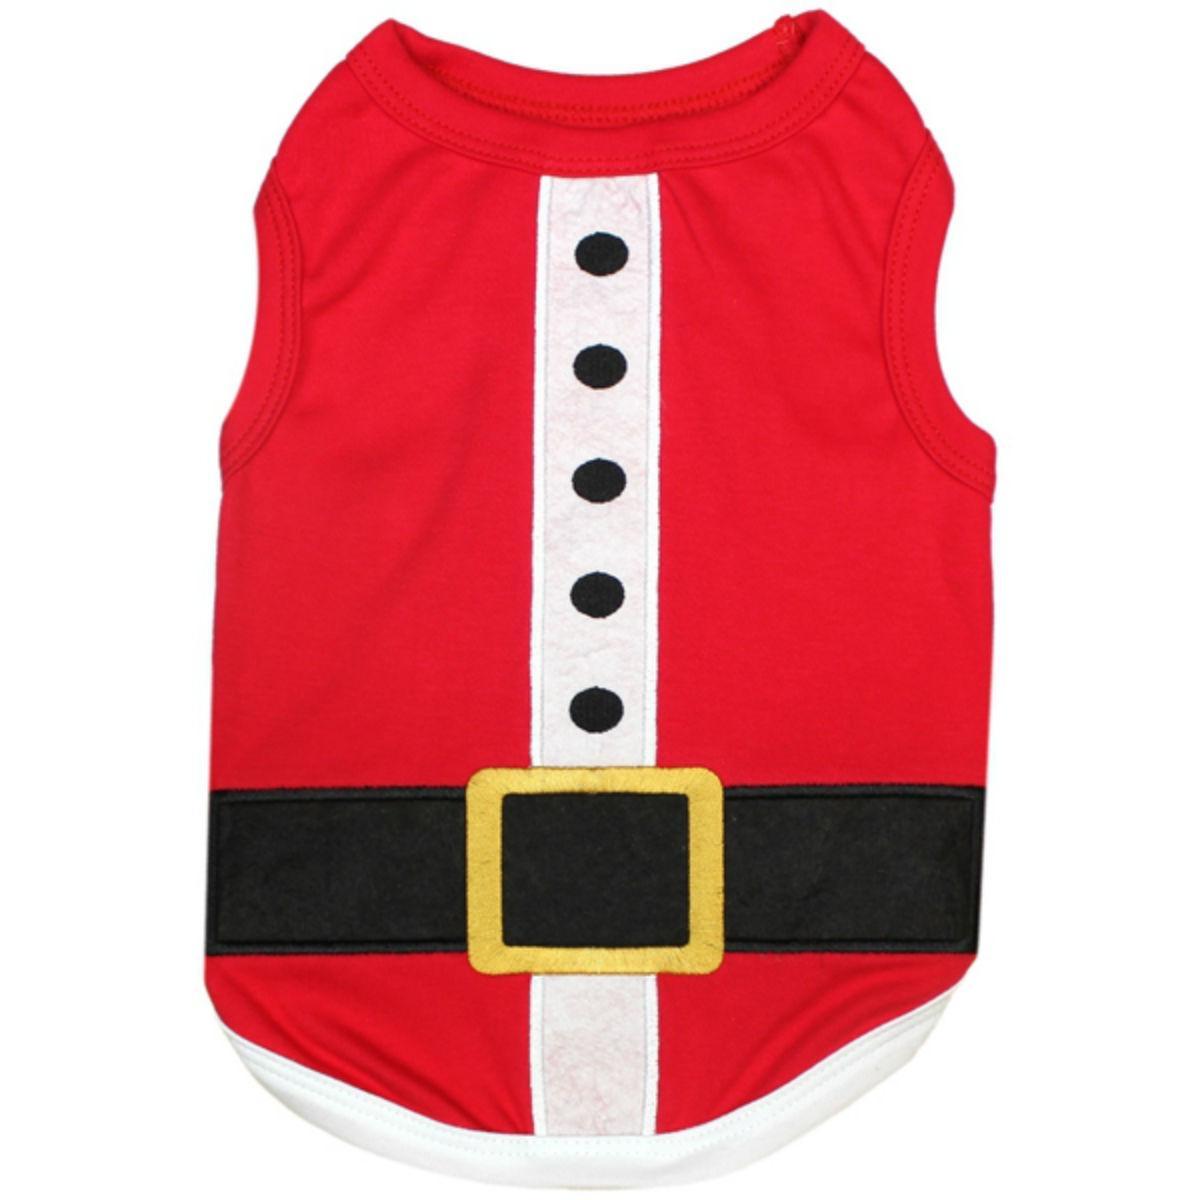 Santa's Outfit Dog Tank by Parisian Pet - Red